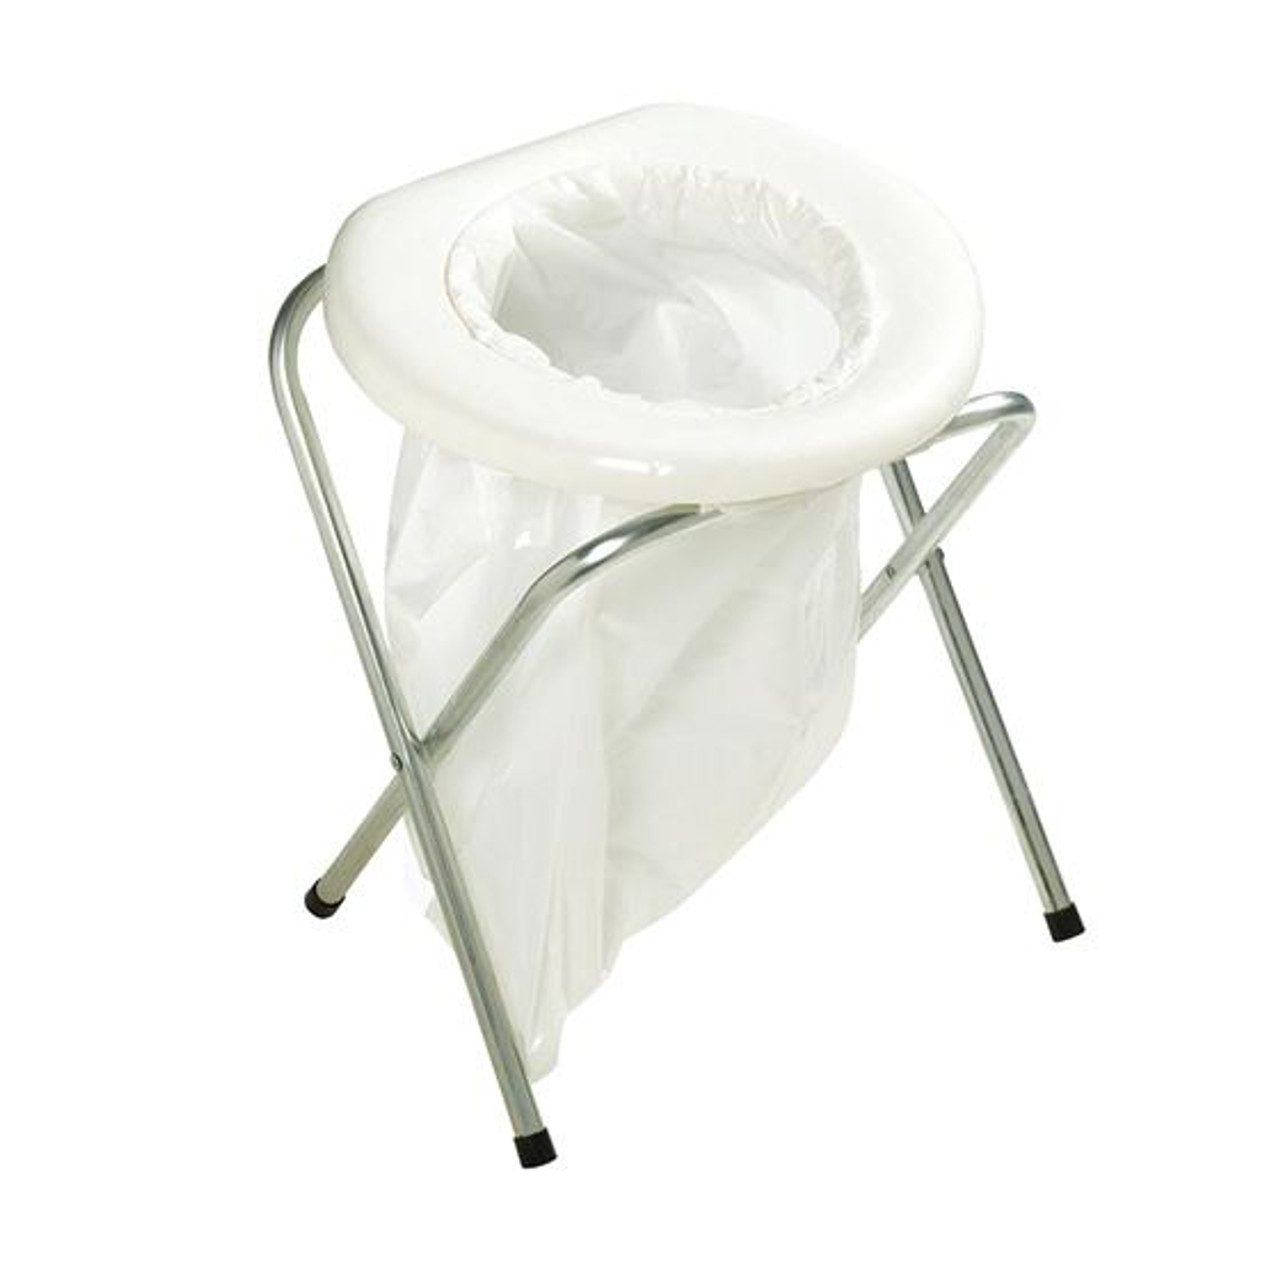 Portable Tiolet